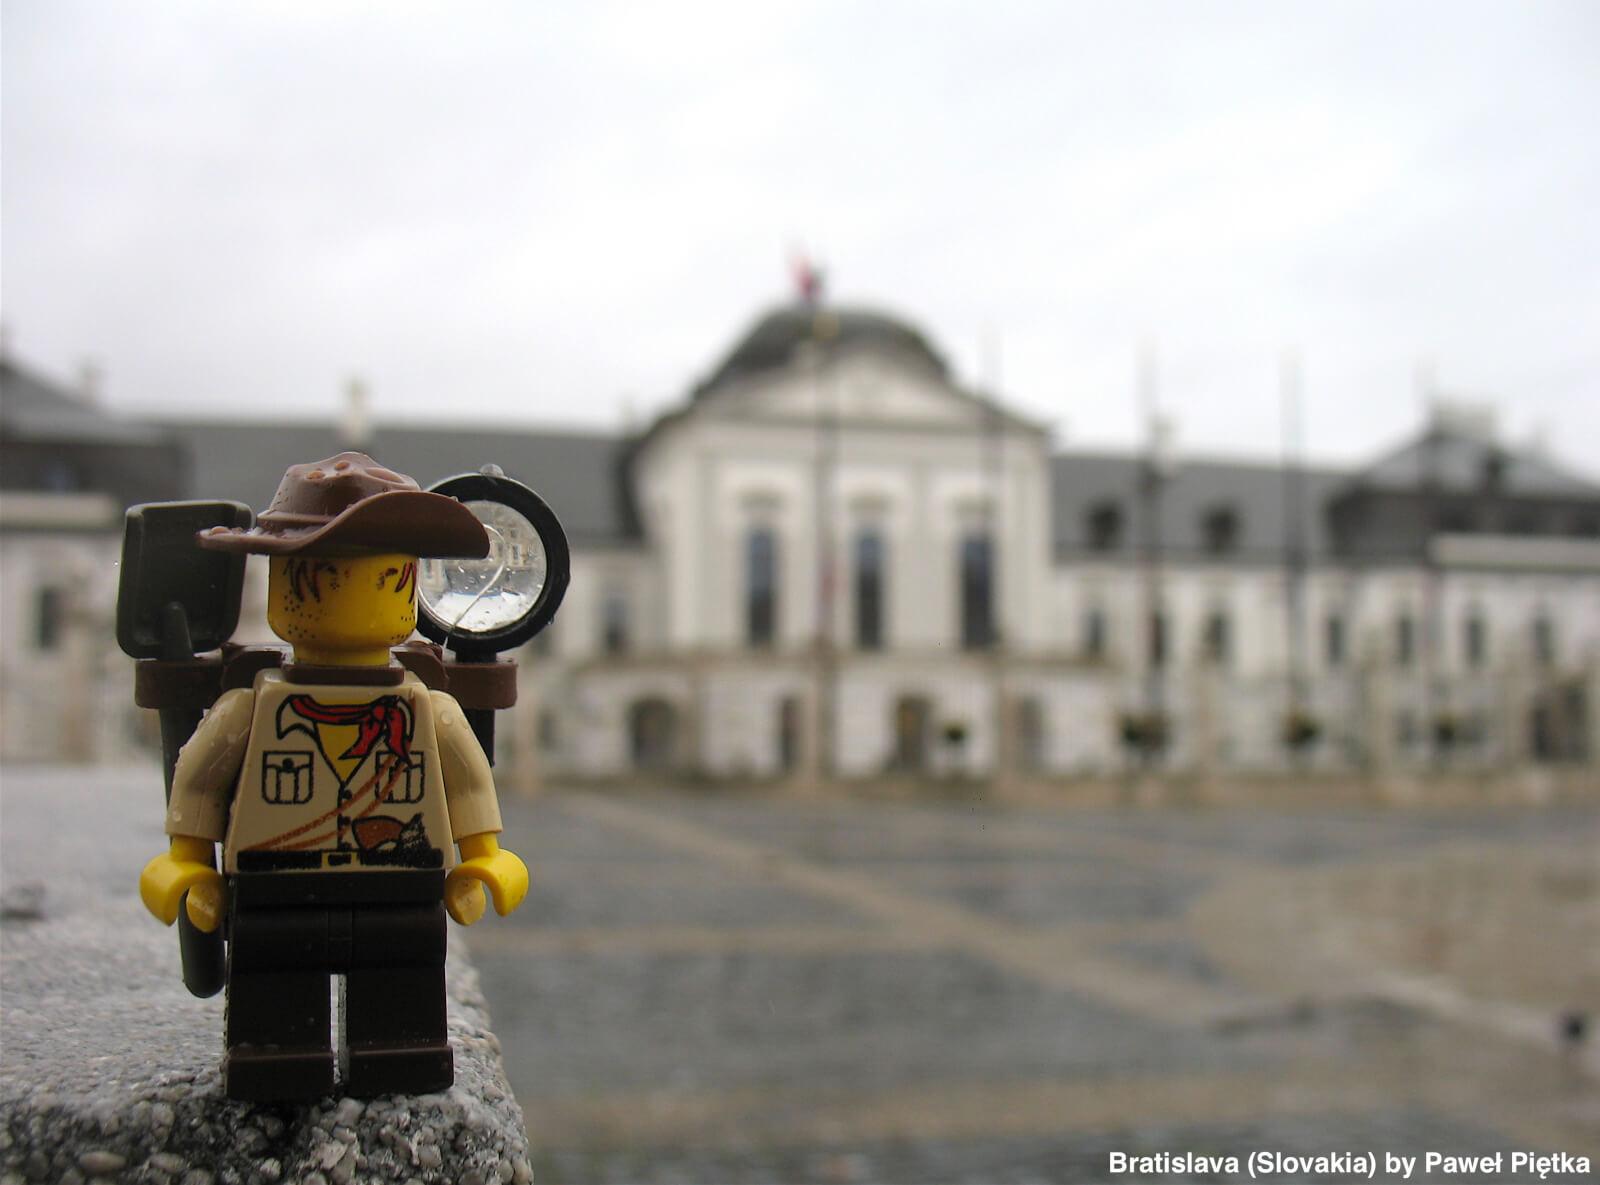 Bratislava (Slovakia) - Grassalkovich Palace